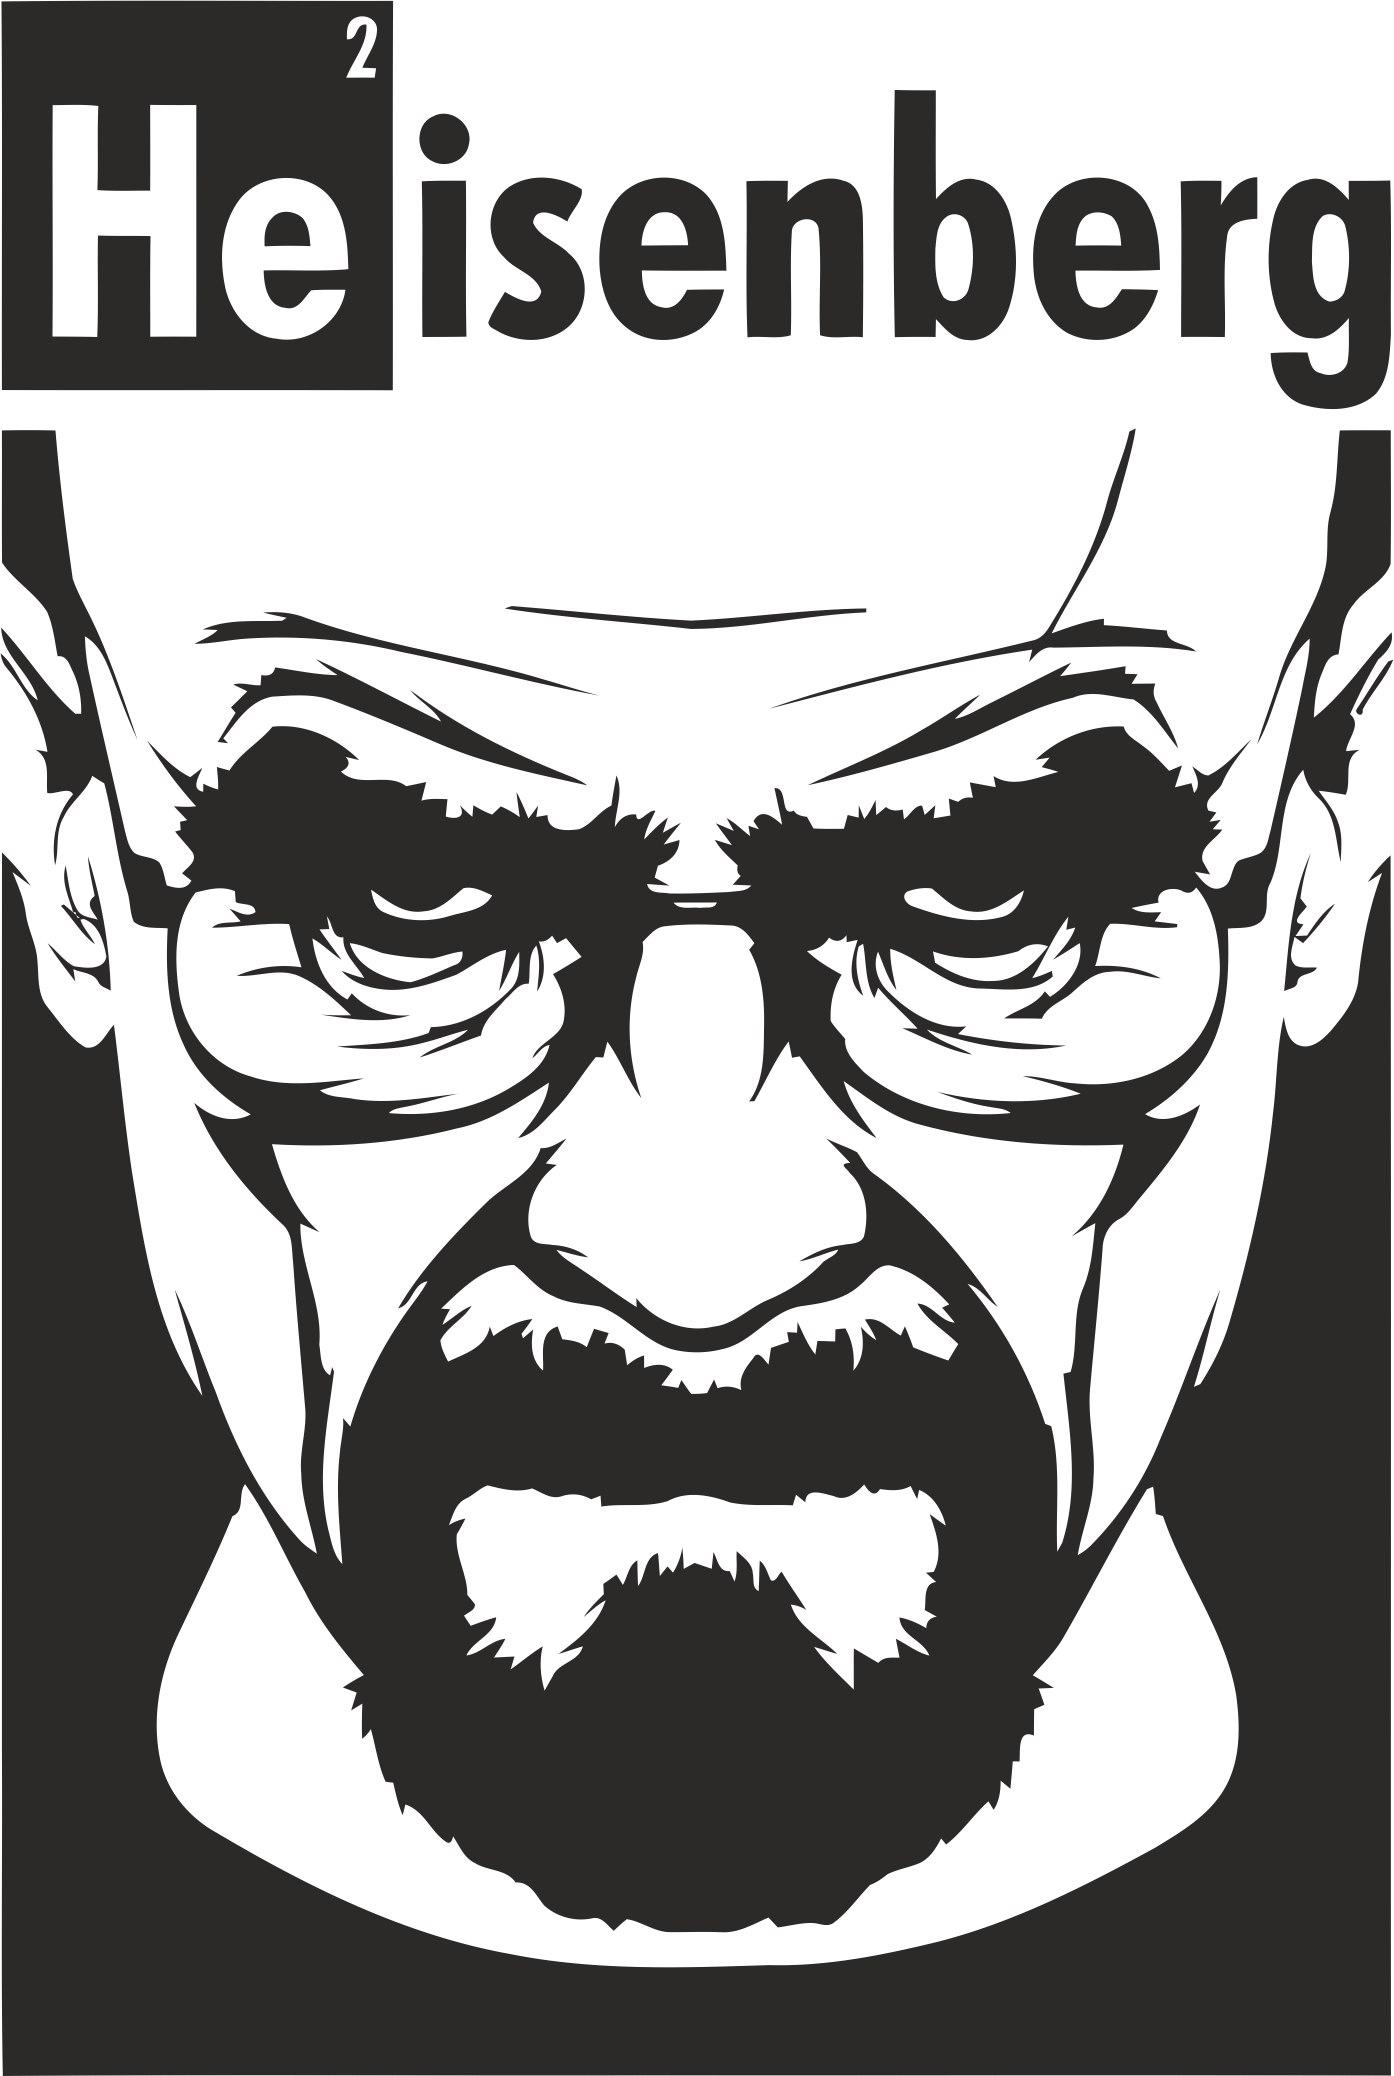 Heisenberg Print Vector